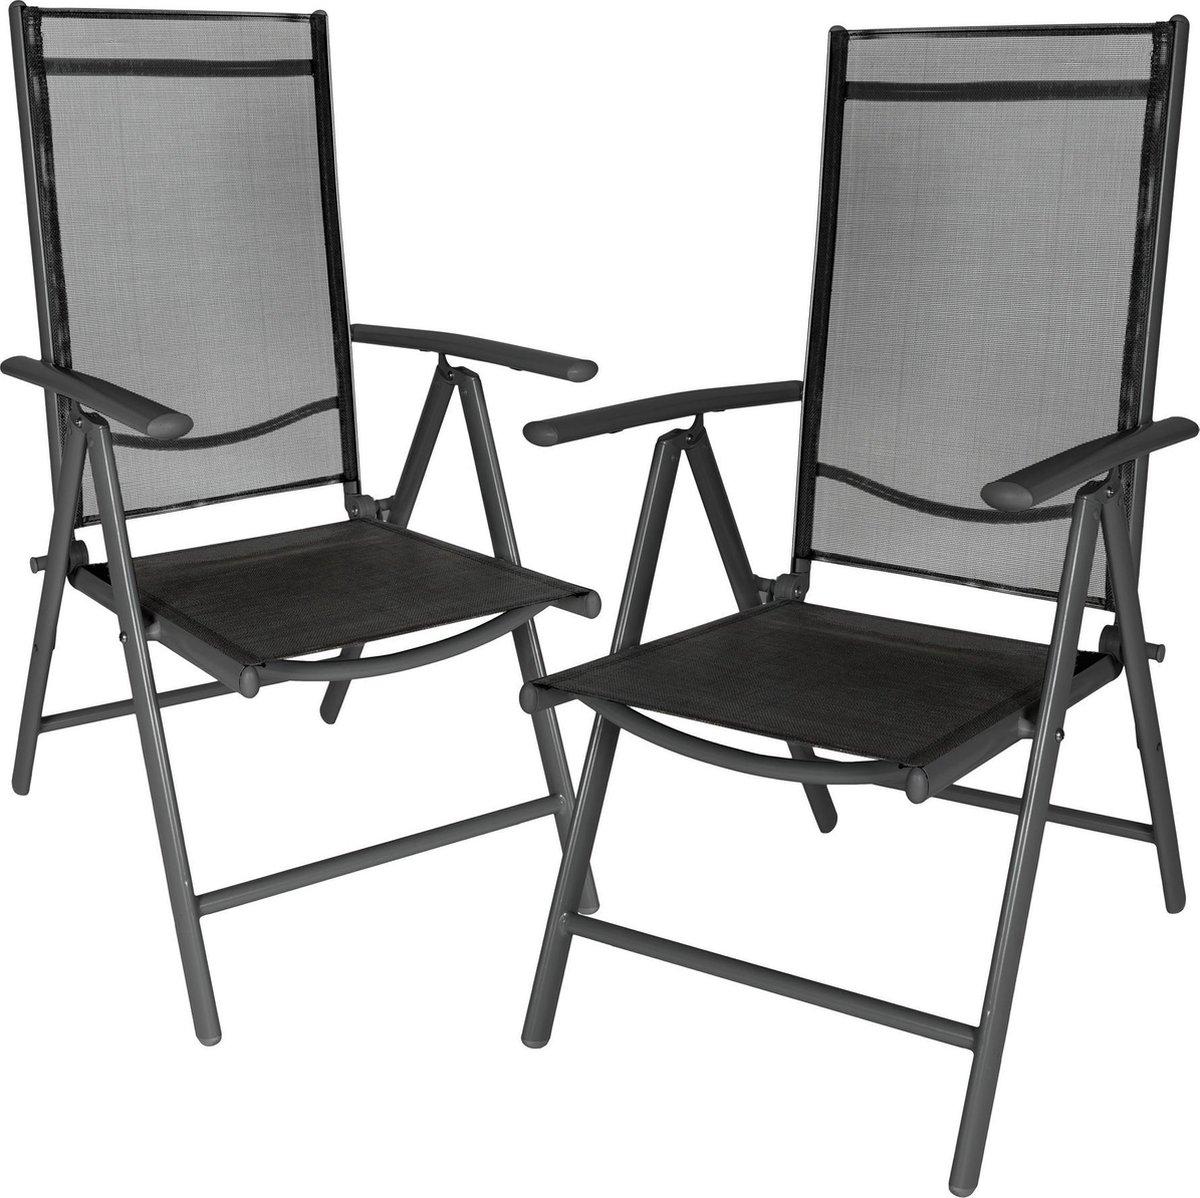 Aluminium tuinstoel  set van 2 stuks - tuin stoel antraciet - zwart